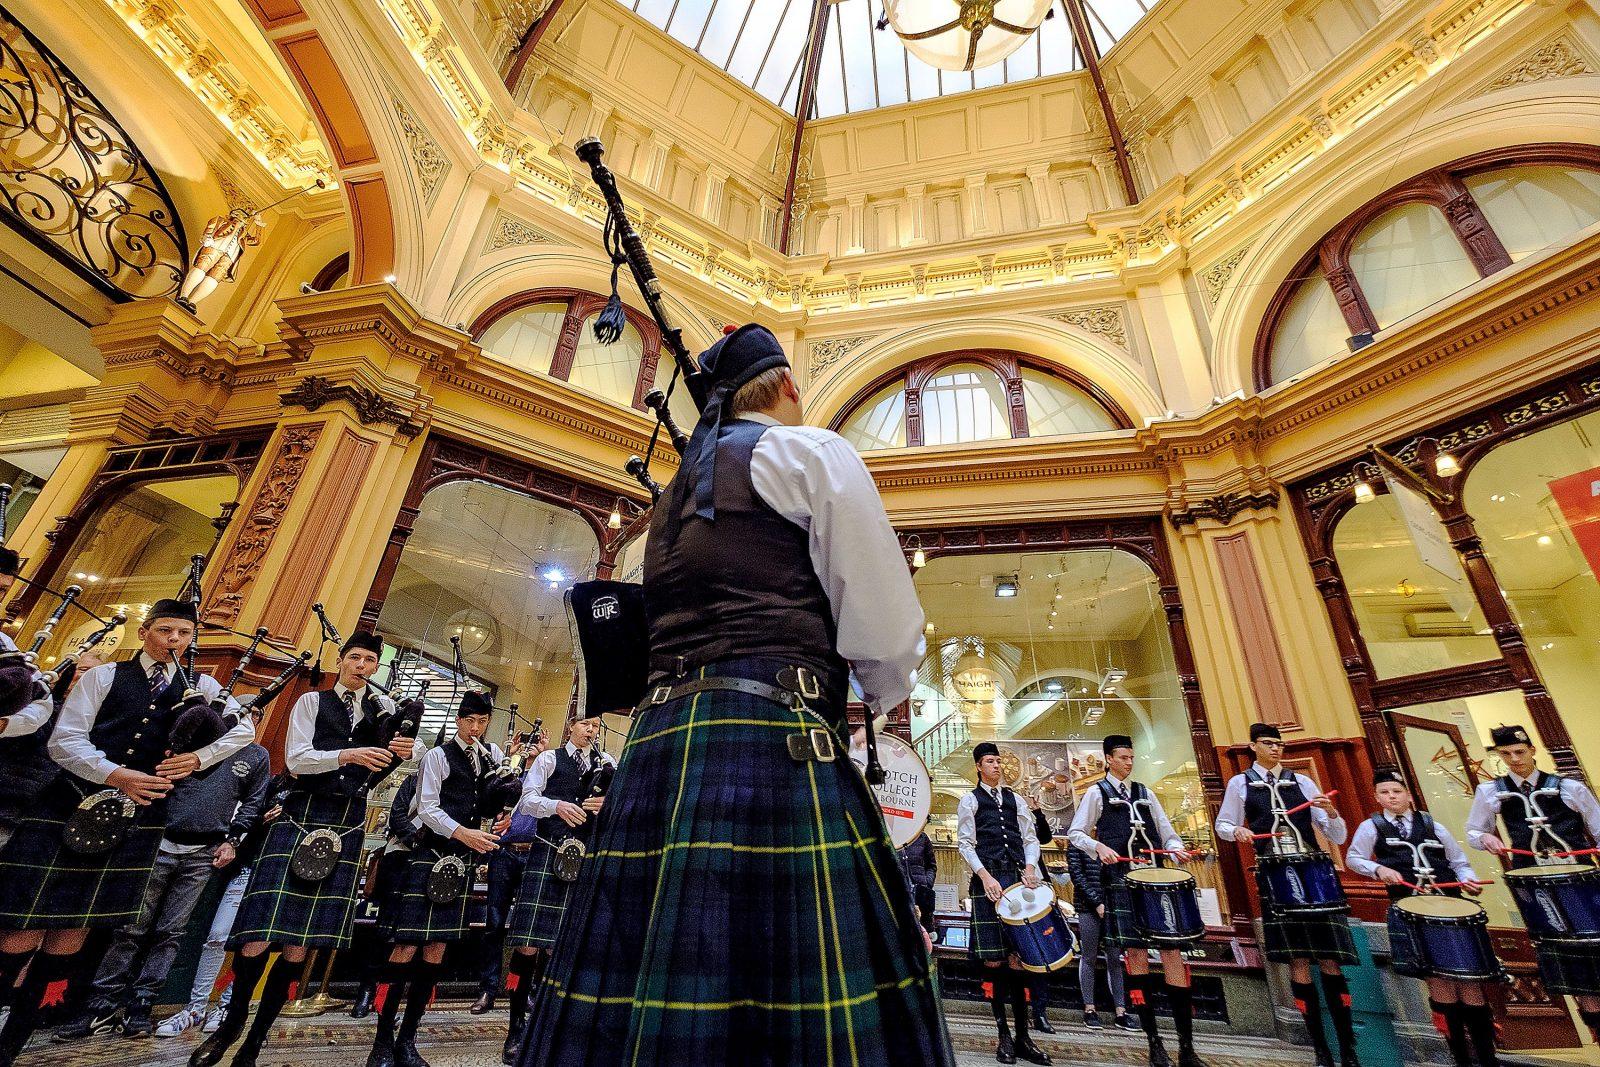 Scotch College Pipe Band